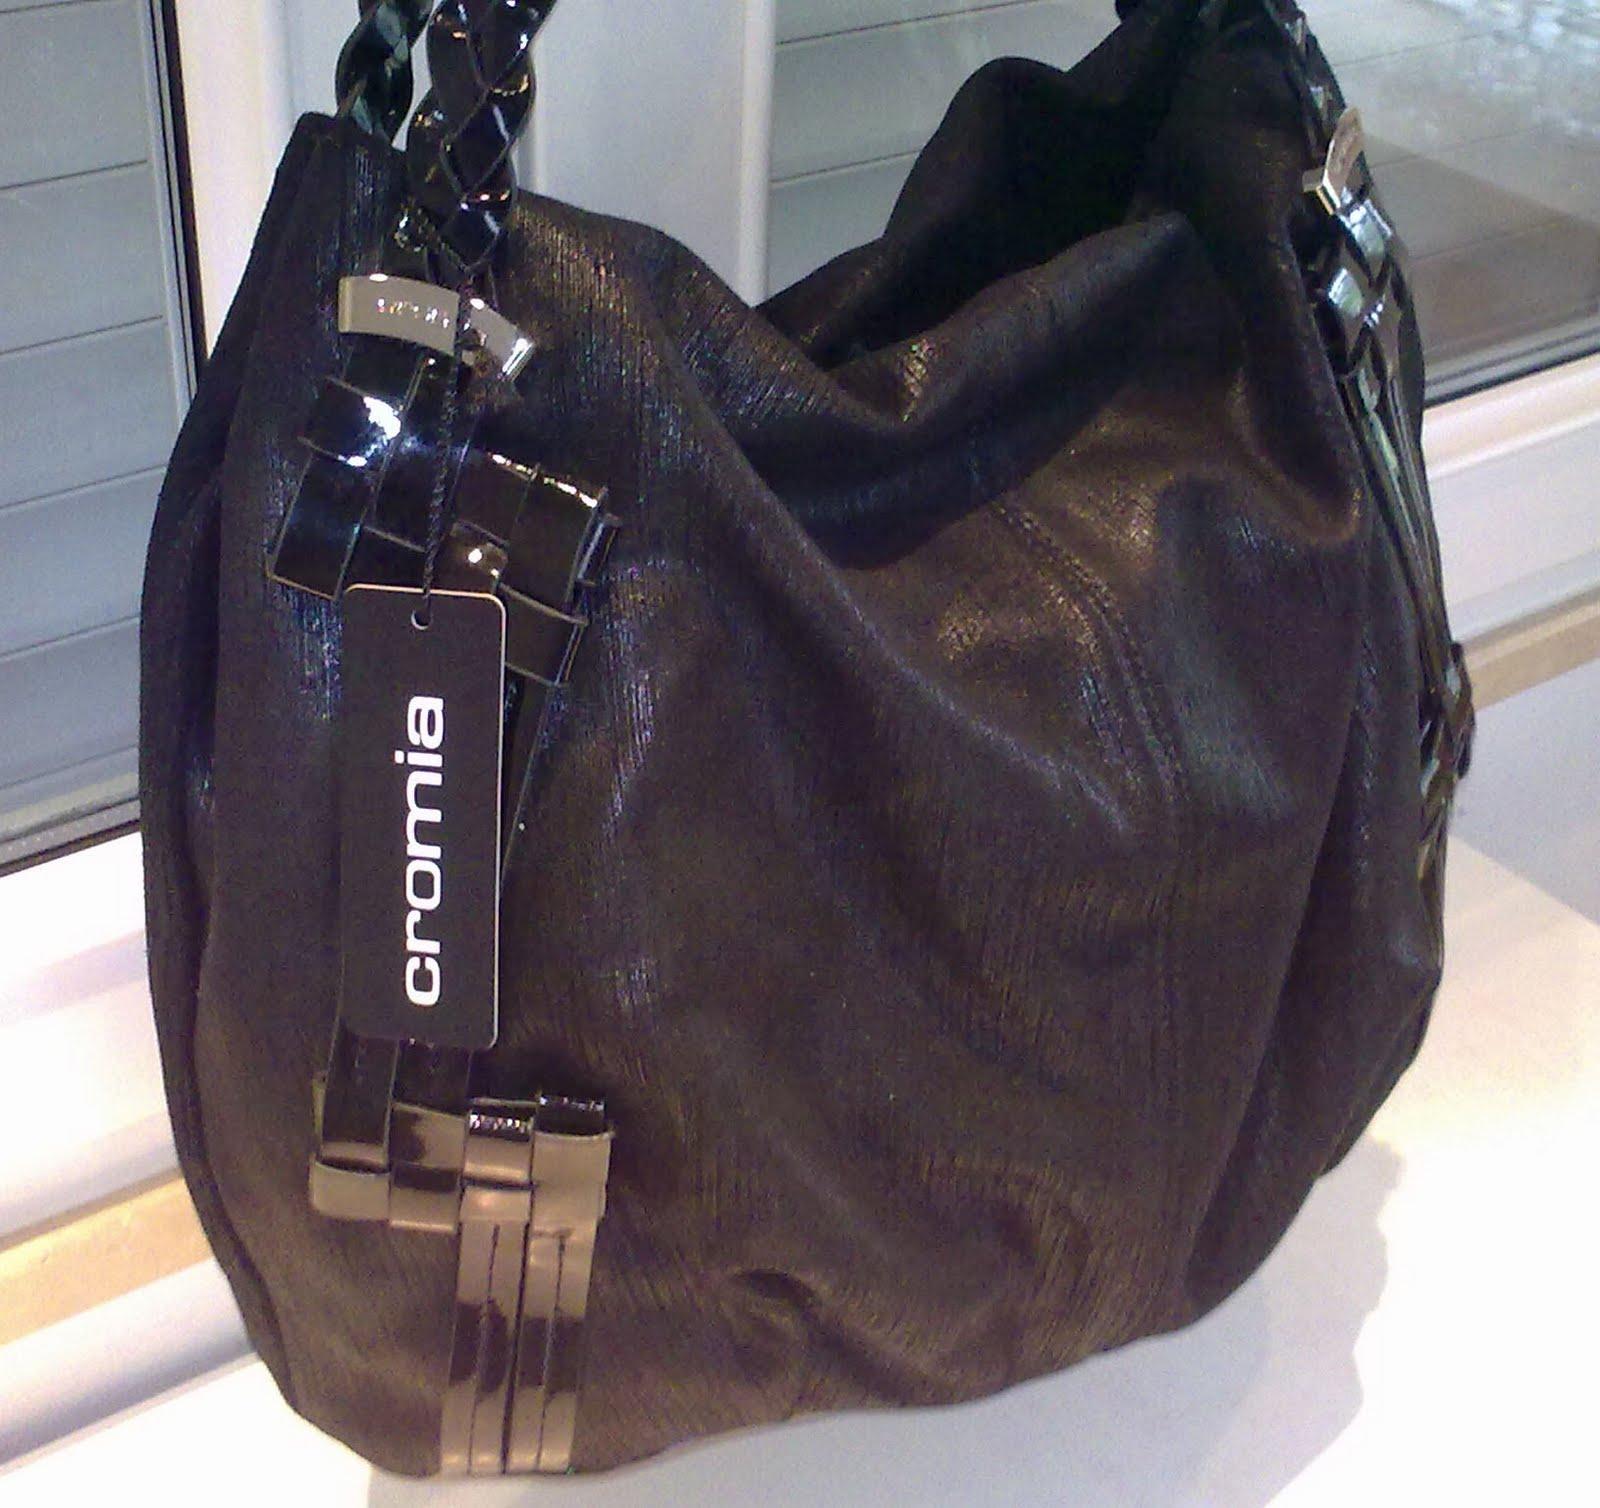 Cromia handbags online in Vancouver